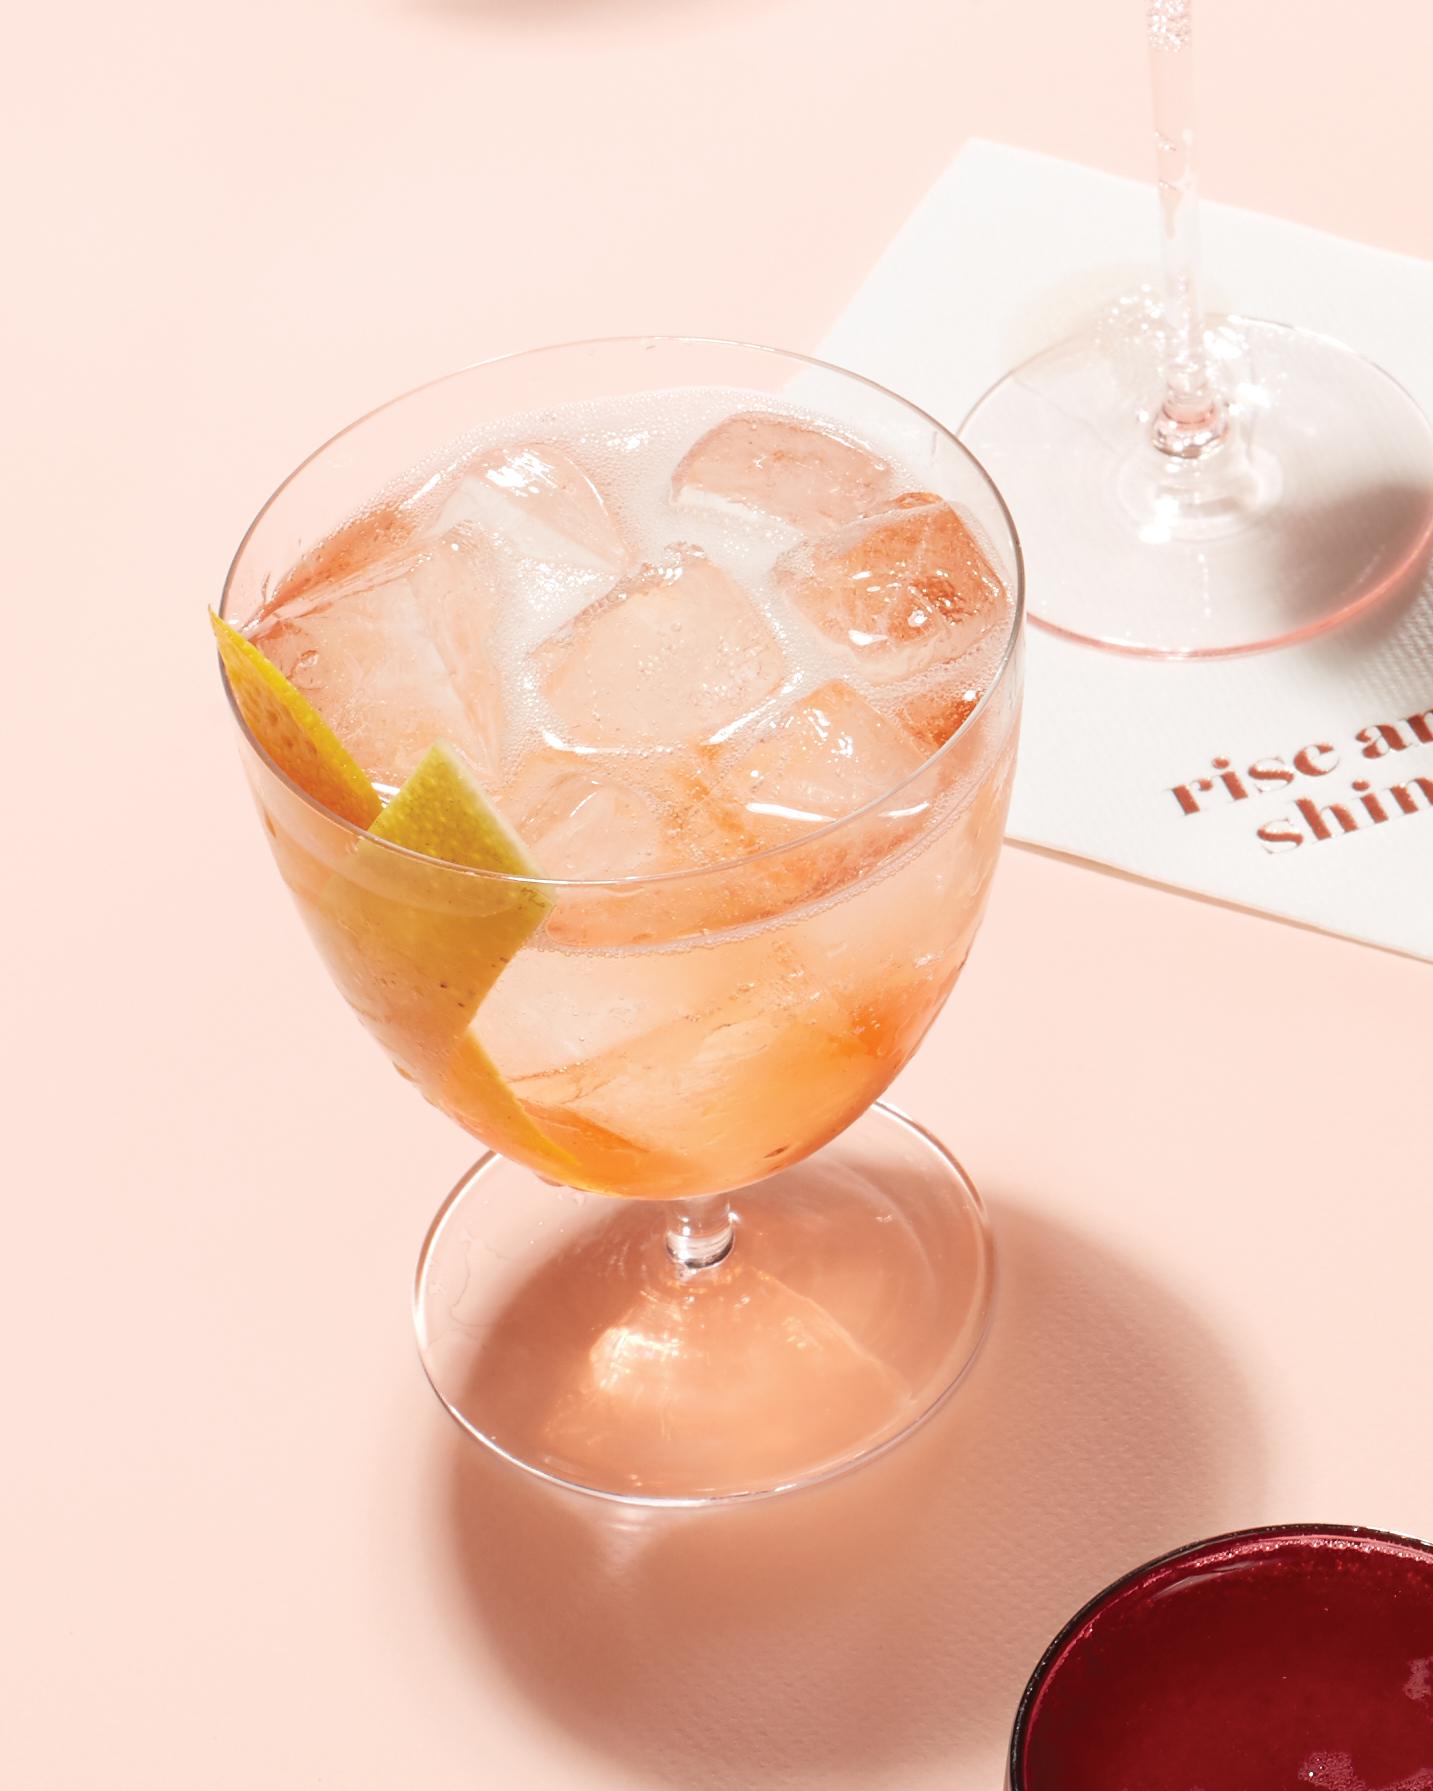 blush-berry-cocktails-sbagliato-rosa-lemon-peel-047-d113029.jpg